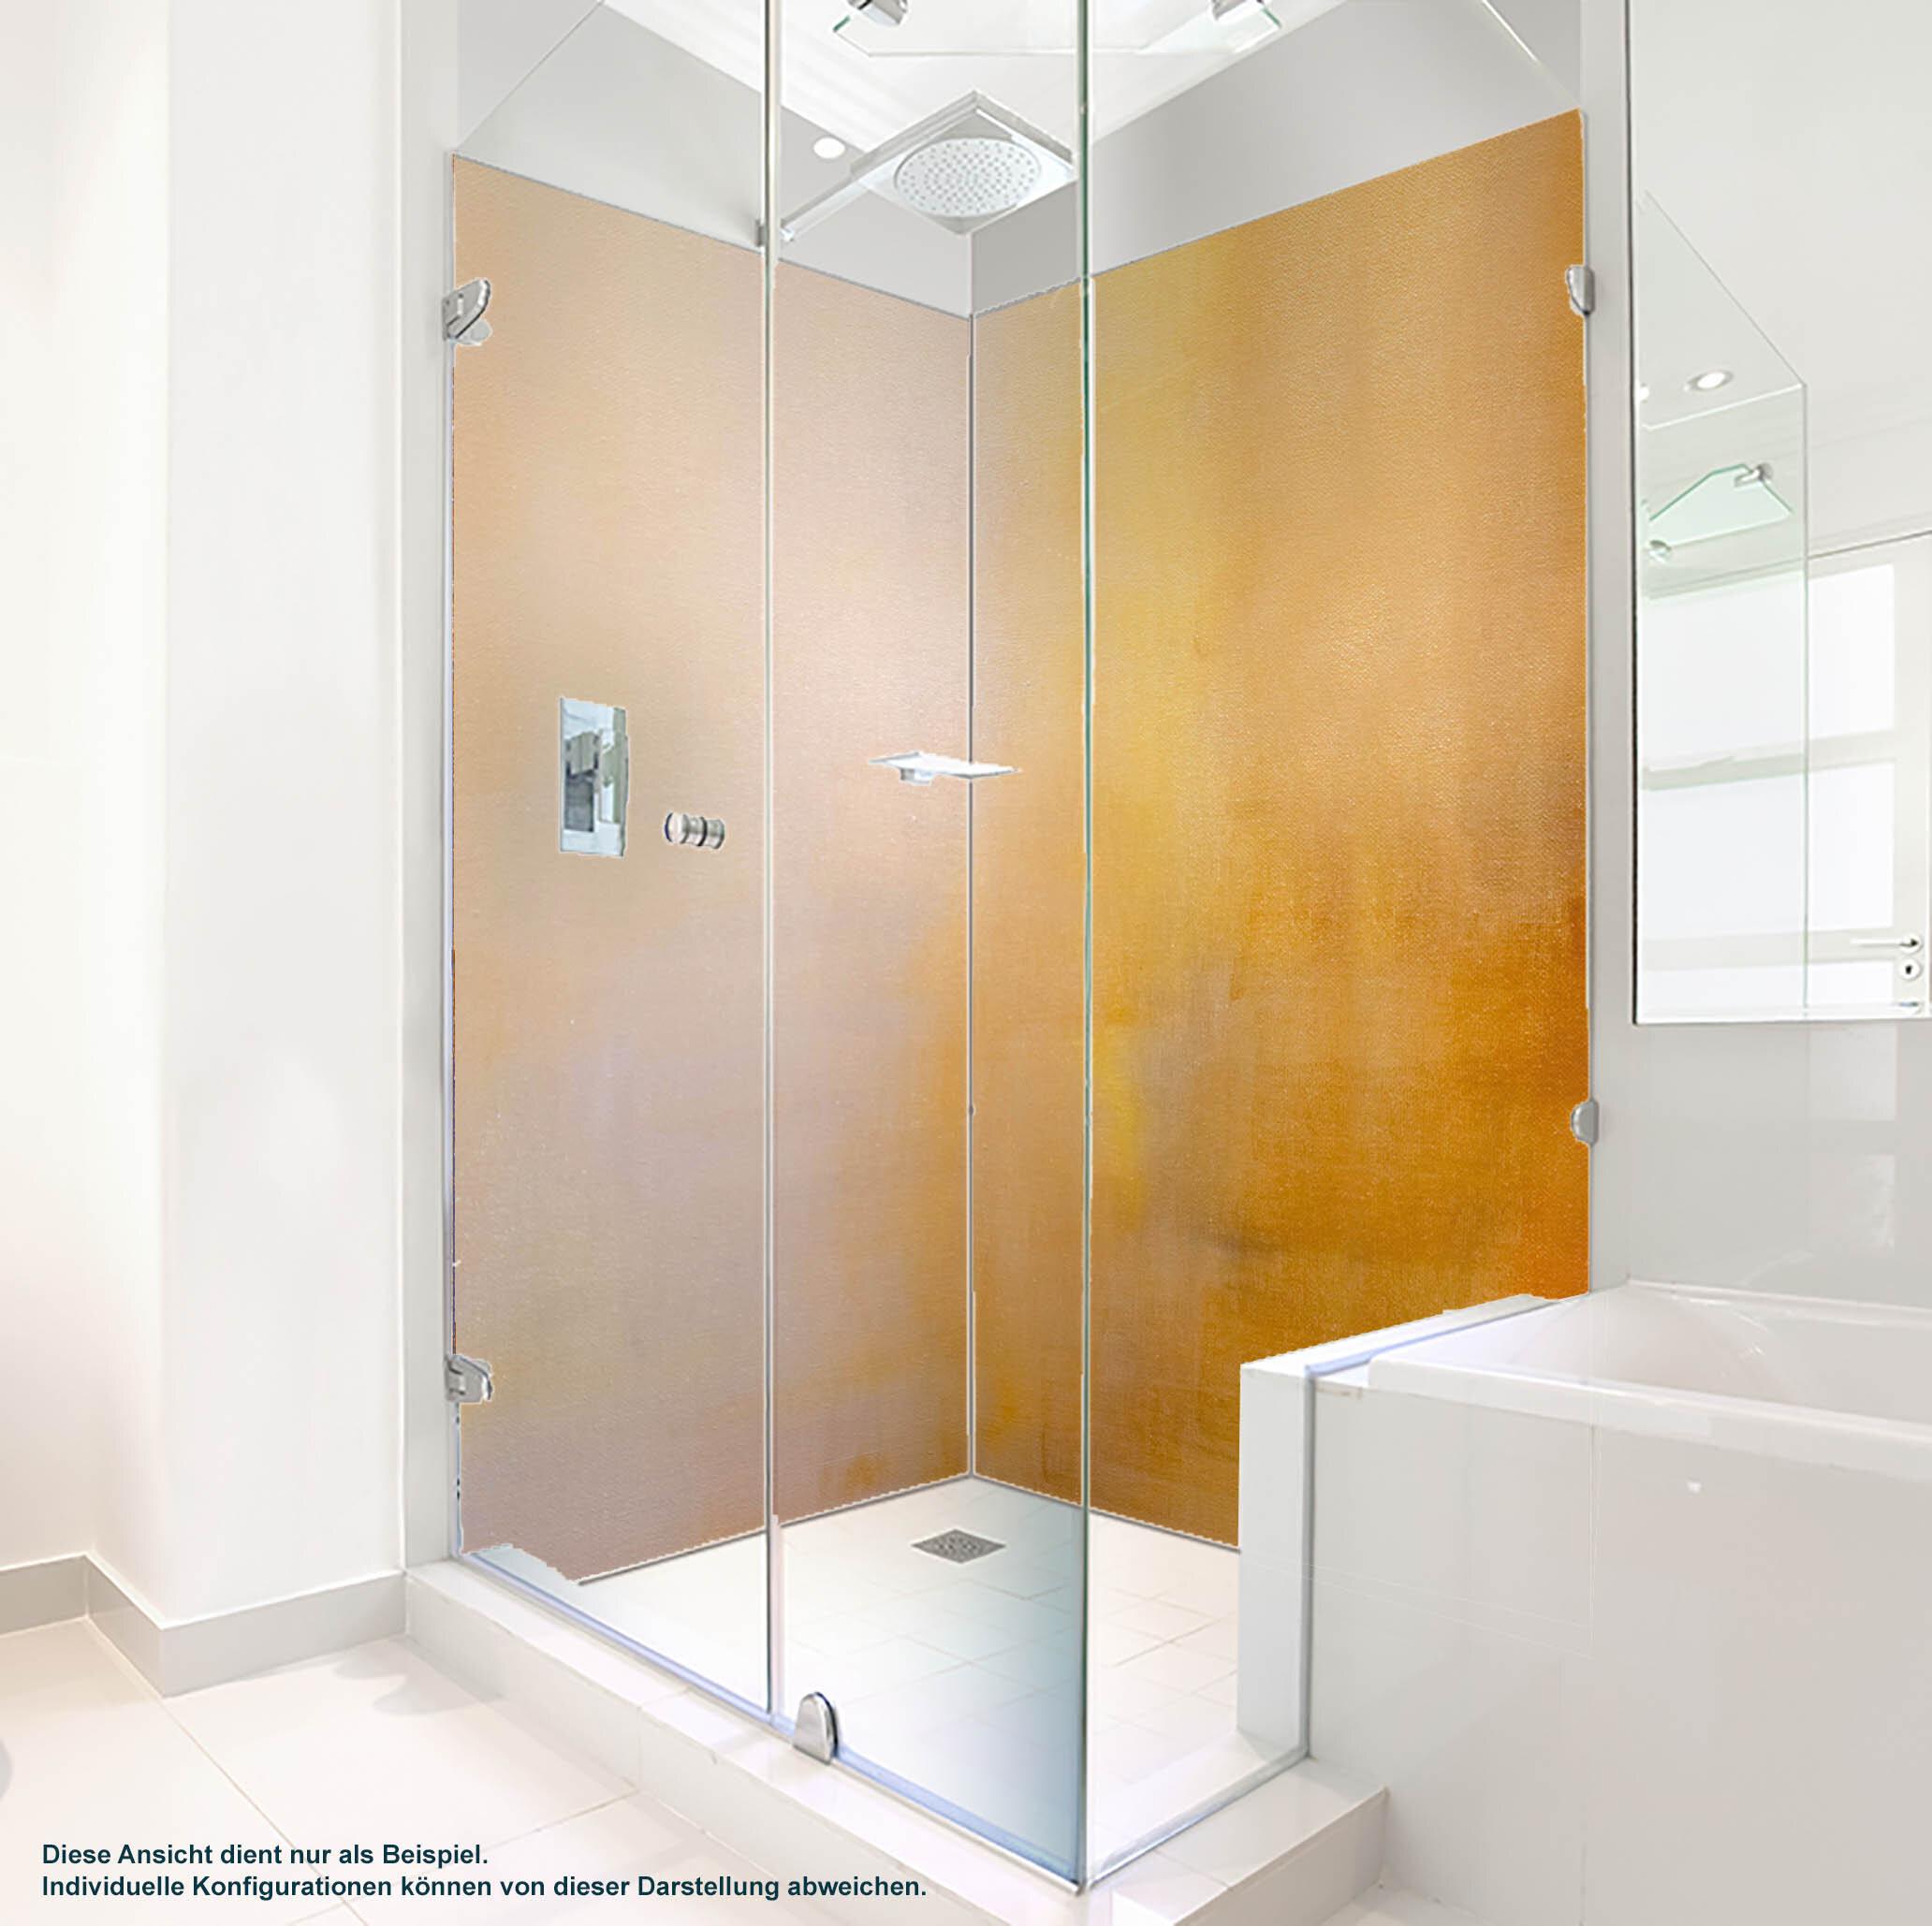 Dusche PlateART Duschrückwand mit Motiv Design Leinwand Orange